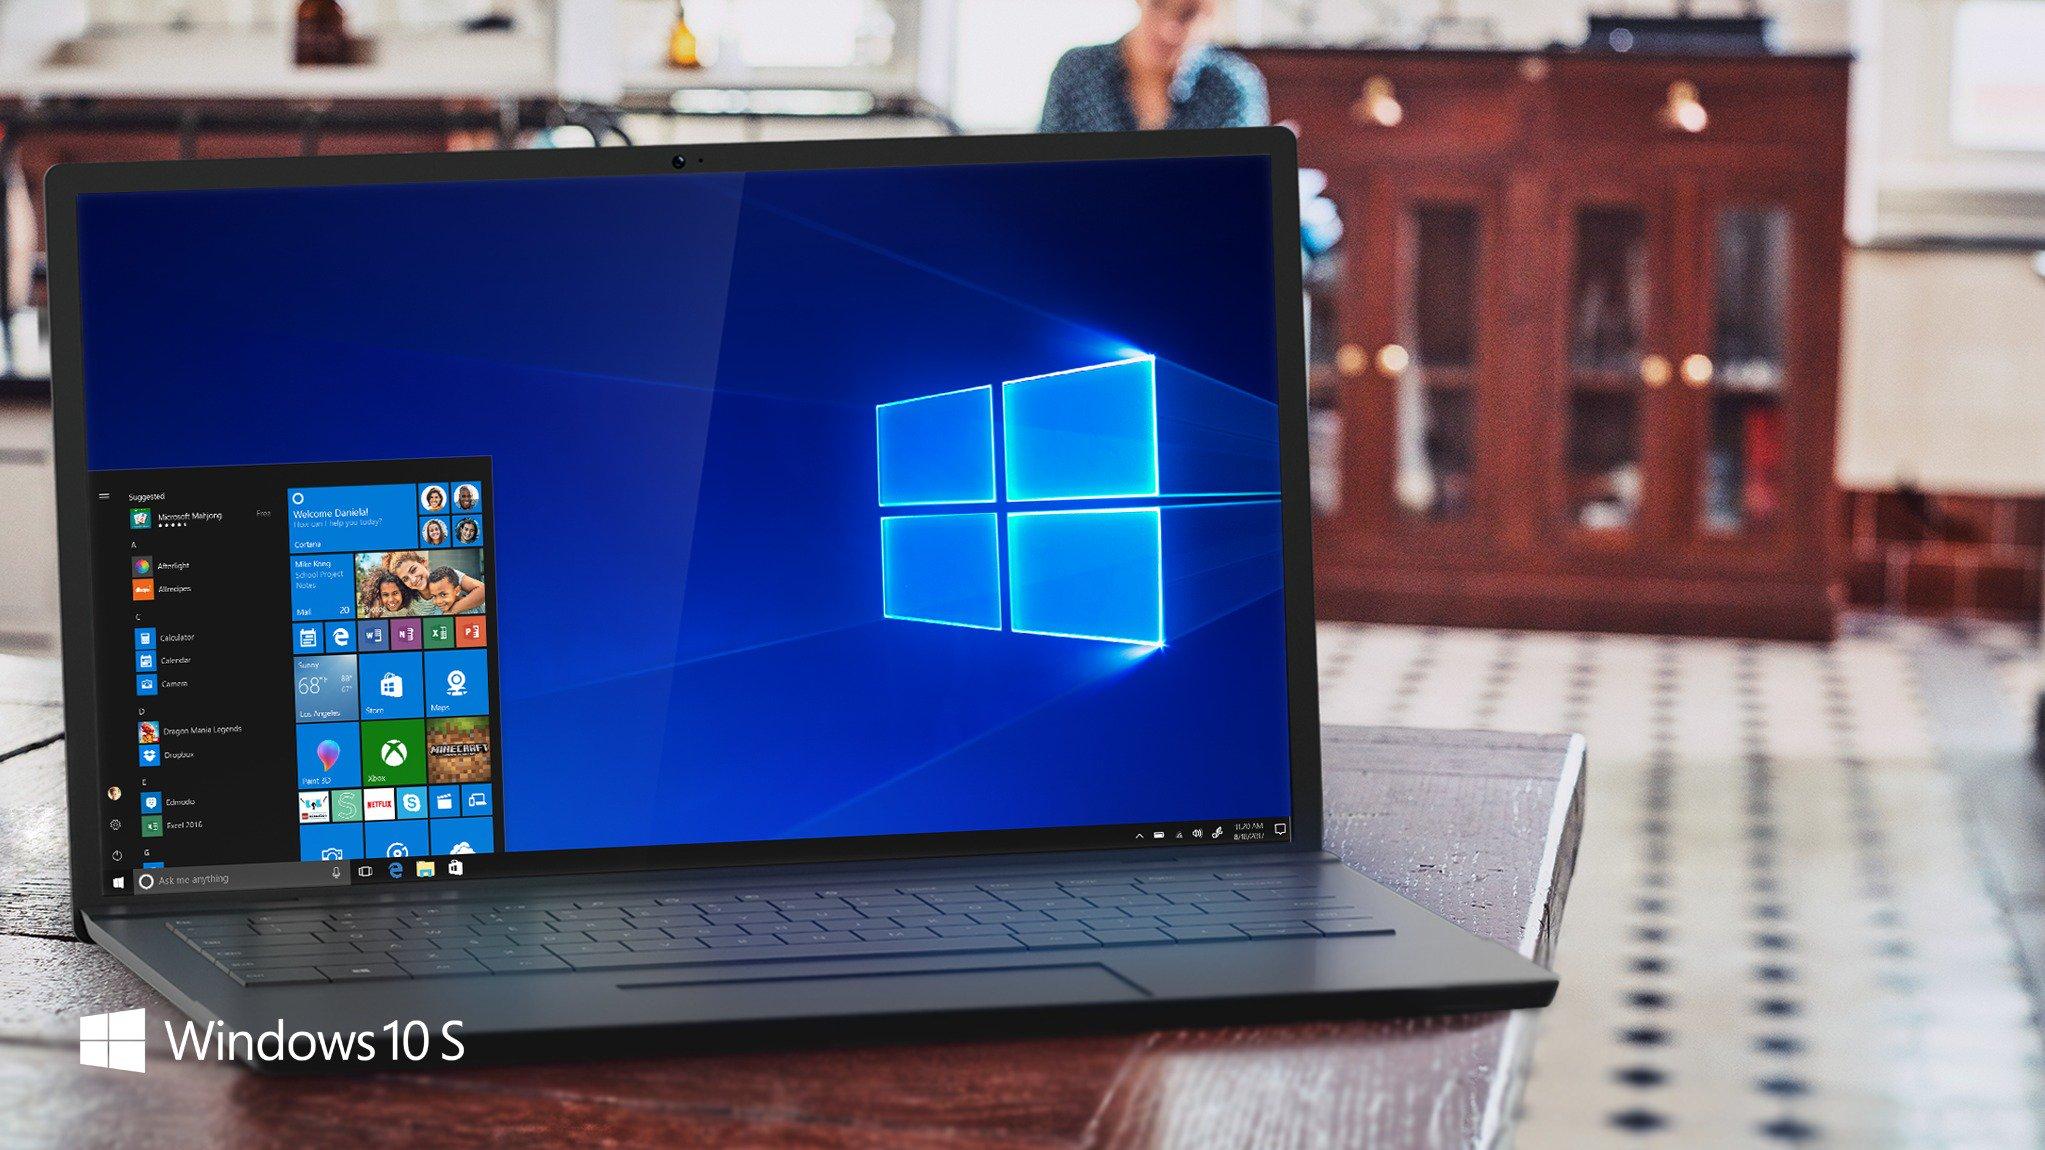 Computador rodando o Windows 10 S